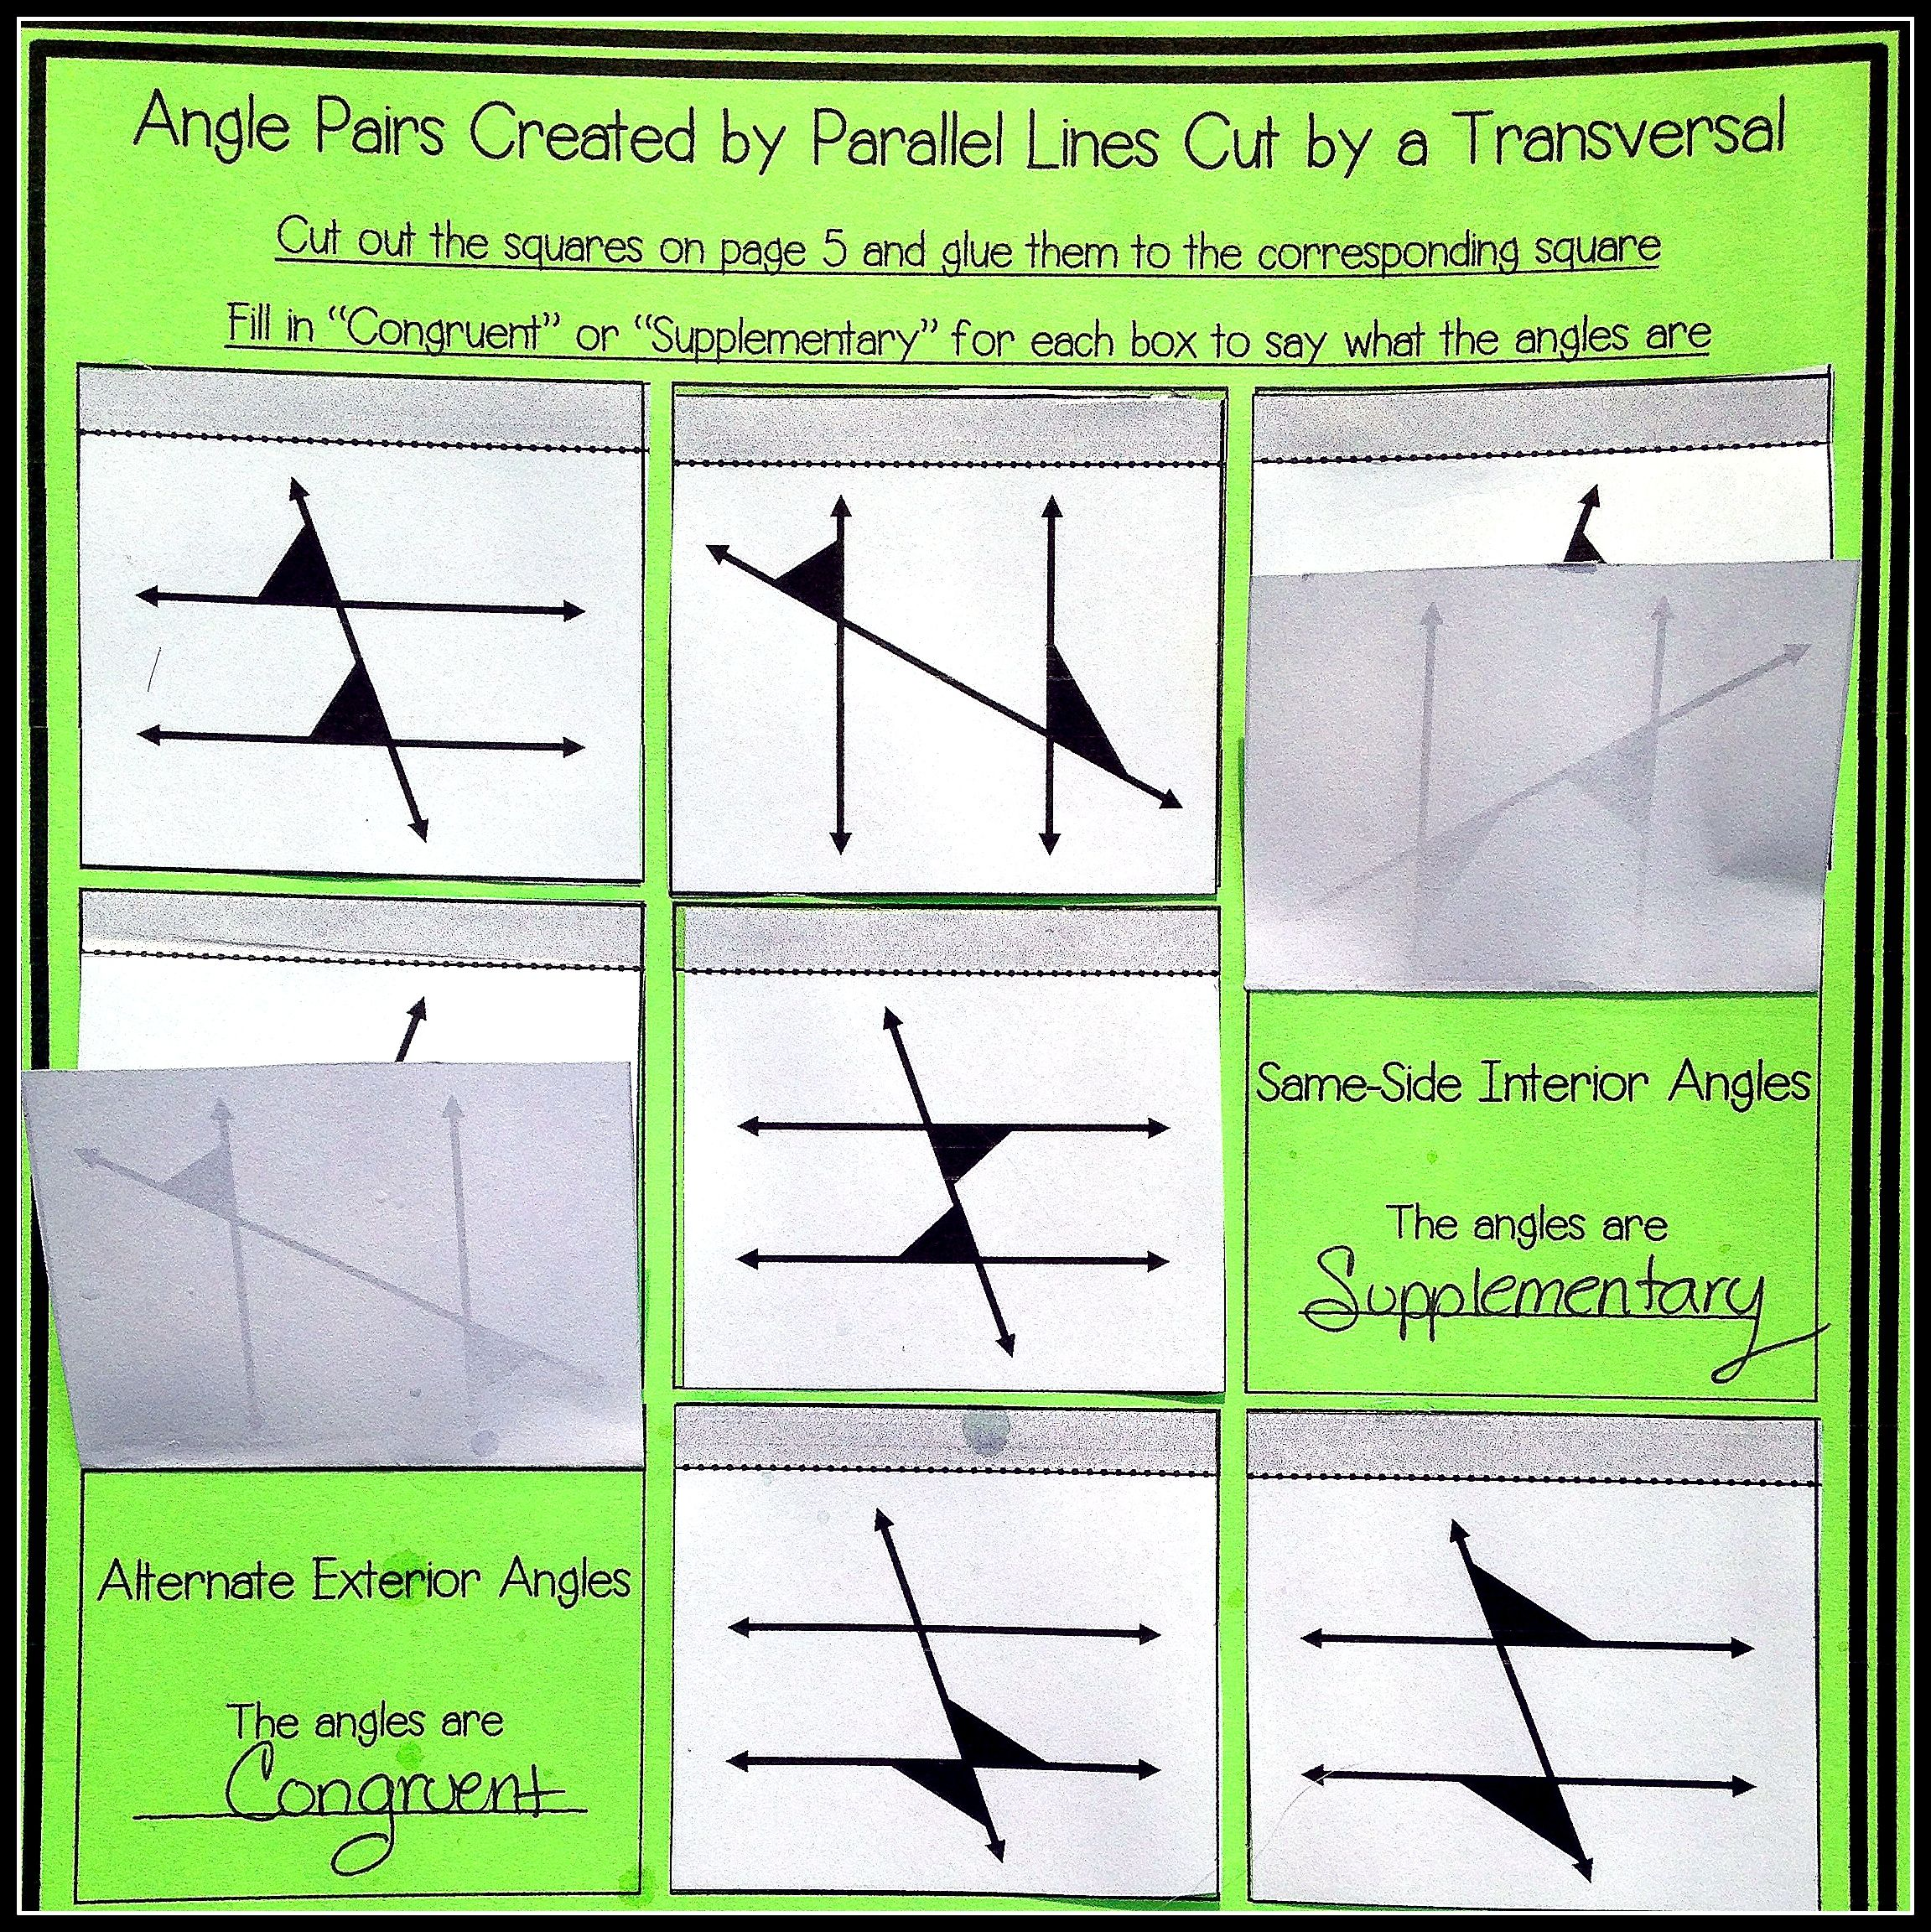 Mathworksheets4kids Angles In Transversal Answer Key